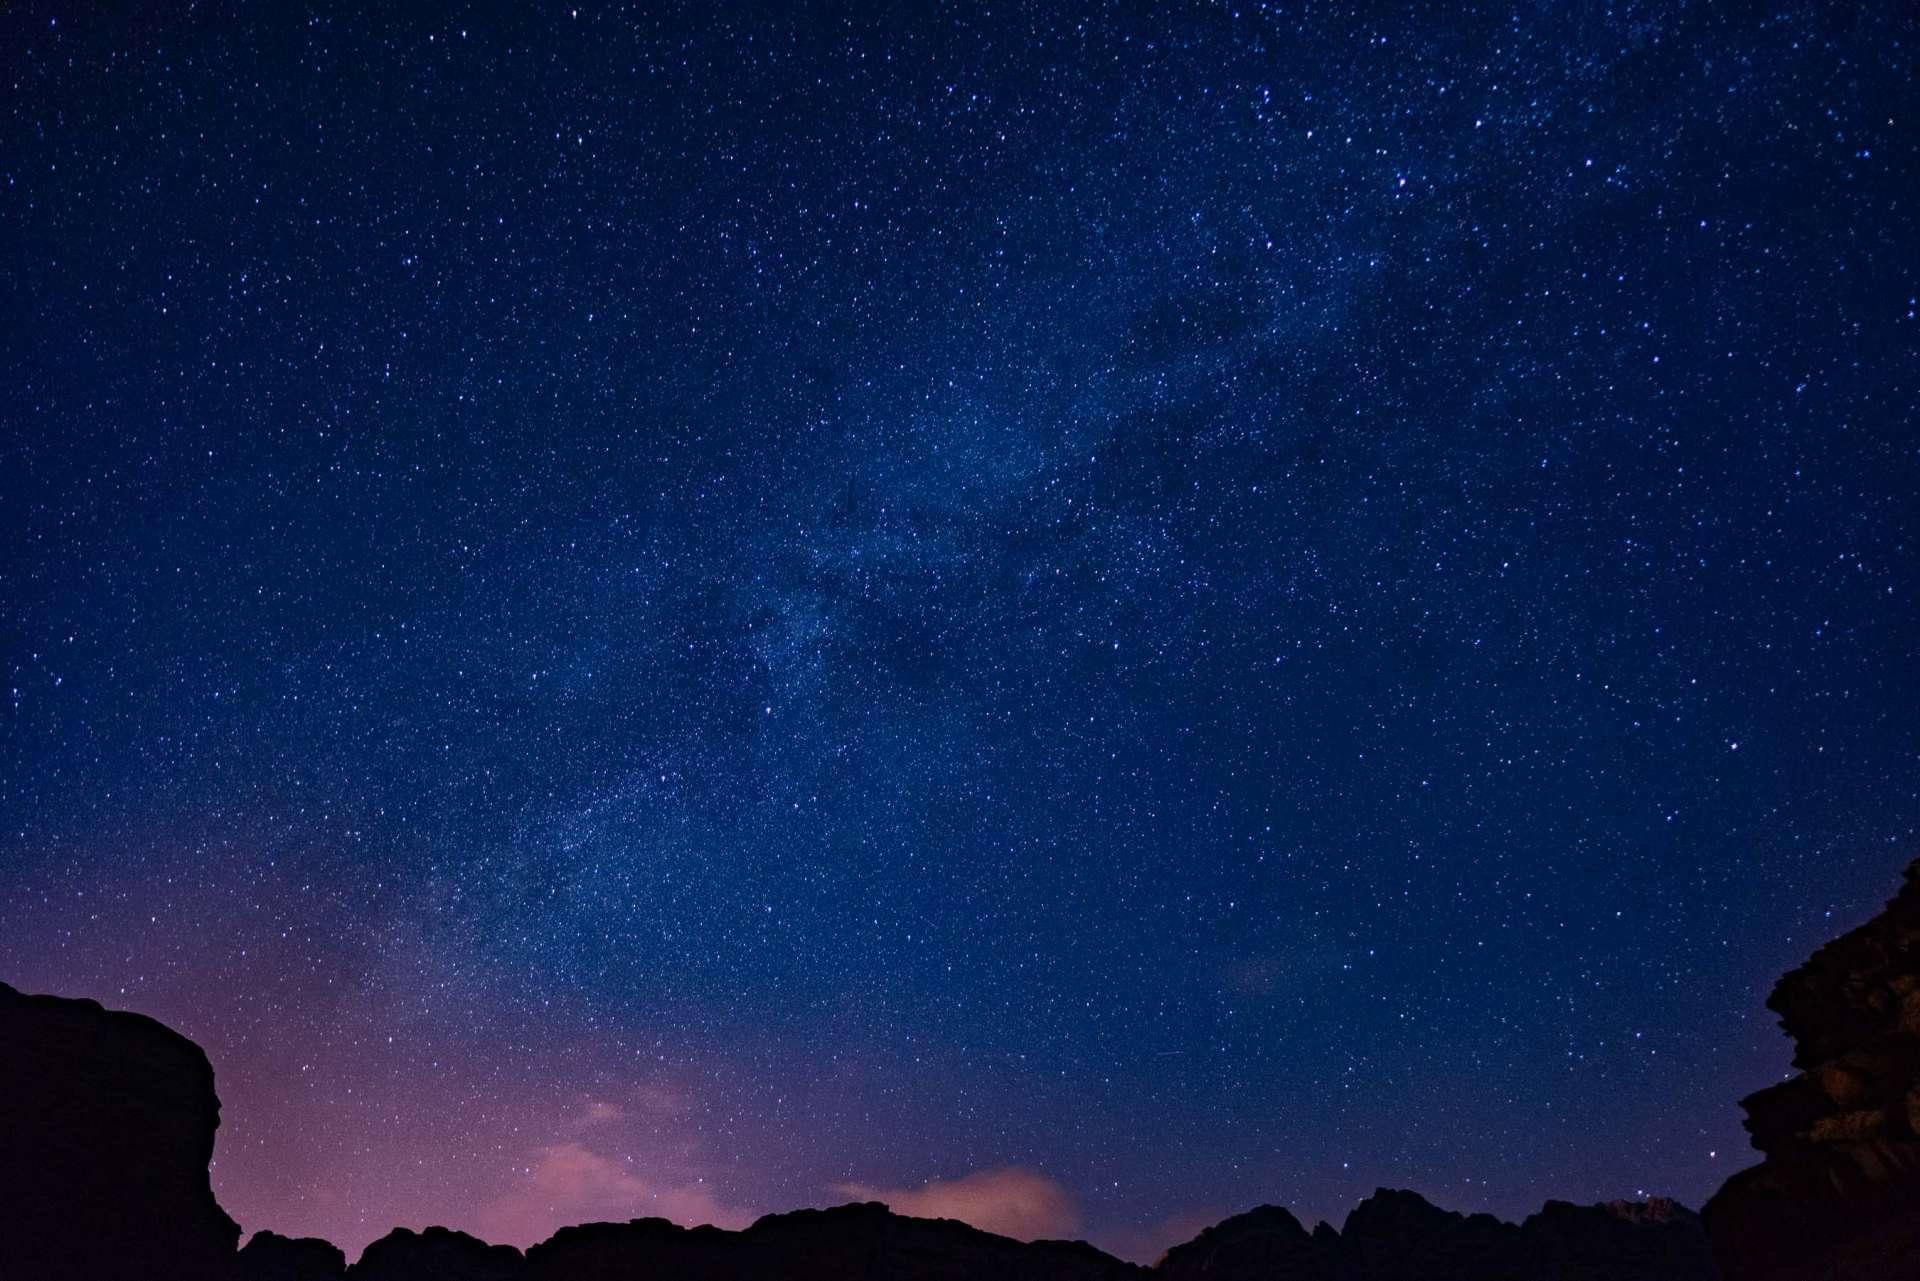 Wadi Rum Night Luxury Camp Full of Stars tent Jordan Enrico Pescantini stargazing stars milky way 2